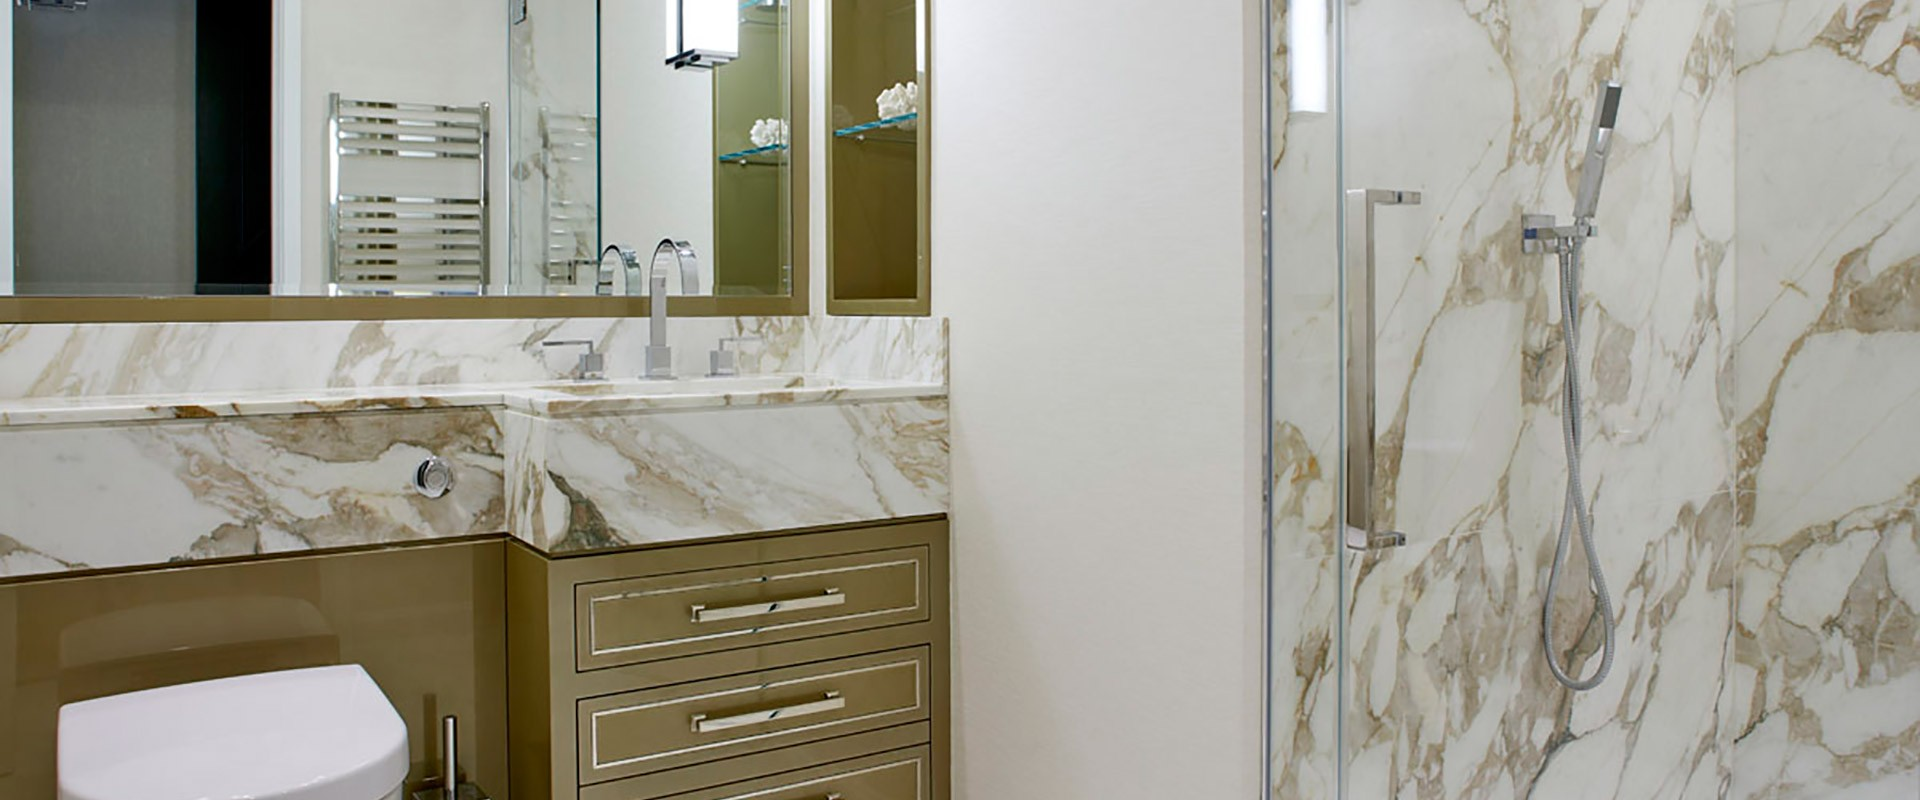 Bespoke Bathroom Glass Installation